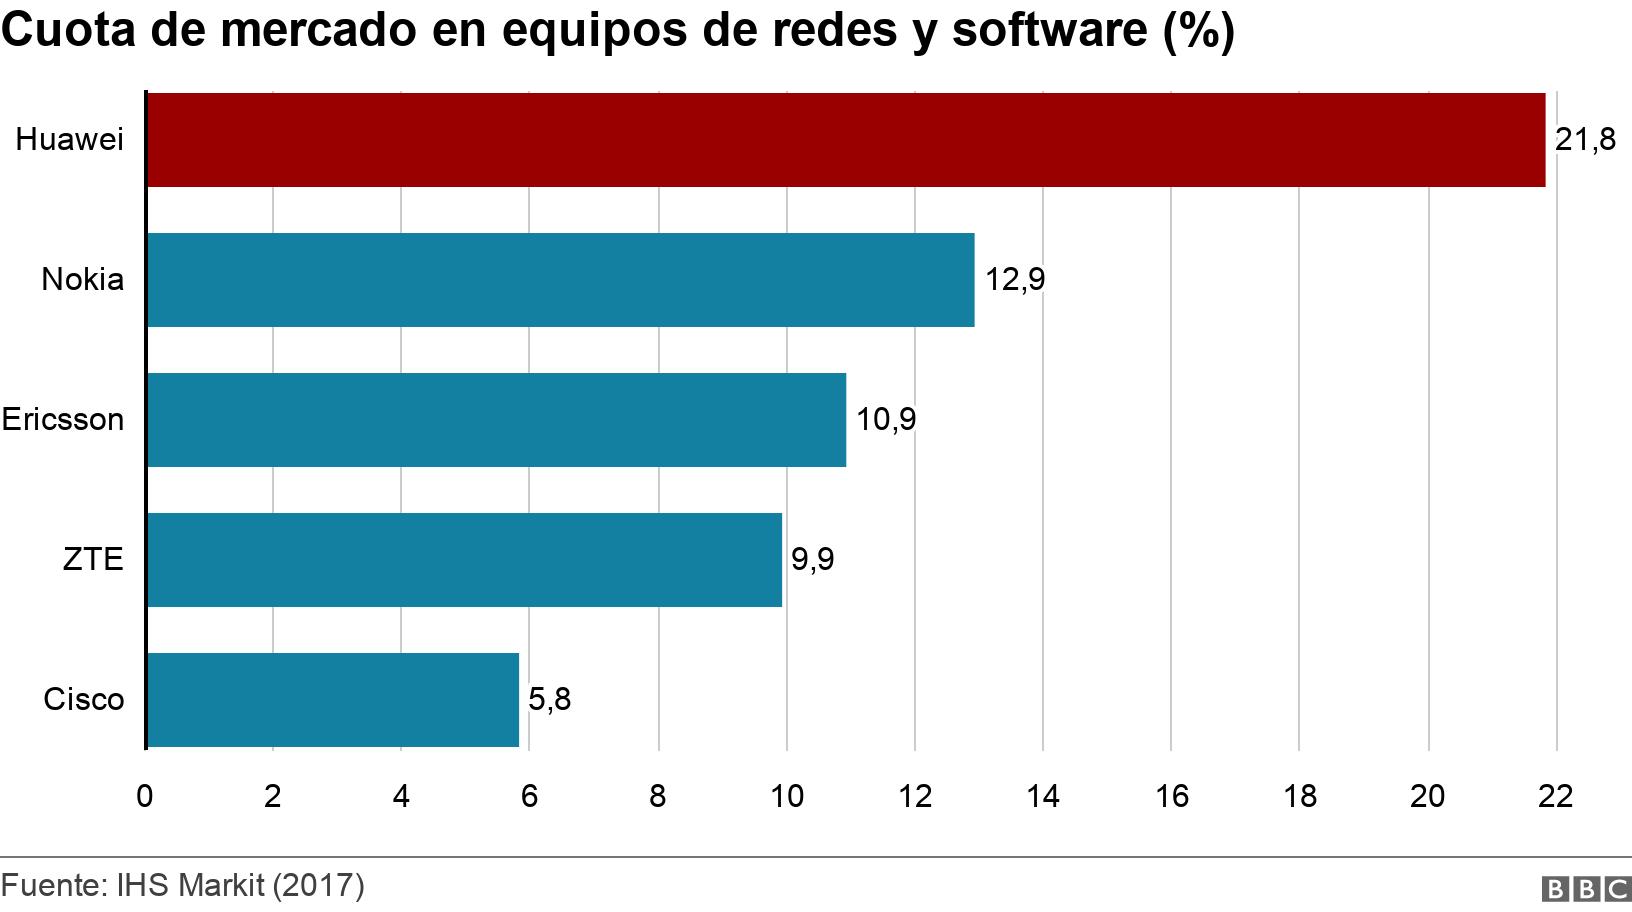 Cuota de mercado en equipos de redes y software (%). . Chart on Network equipment and software market share .